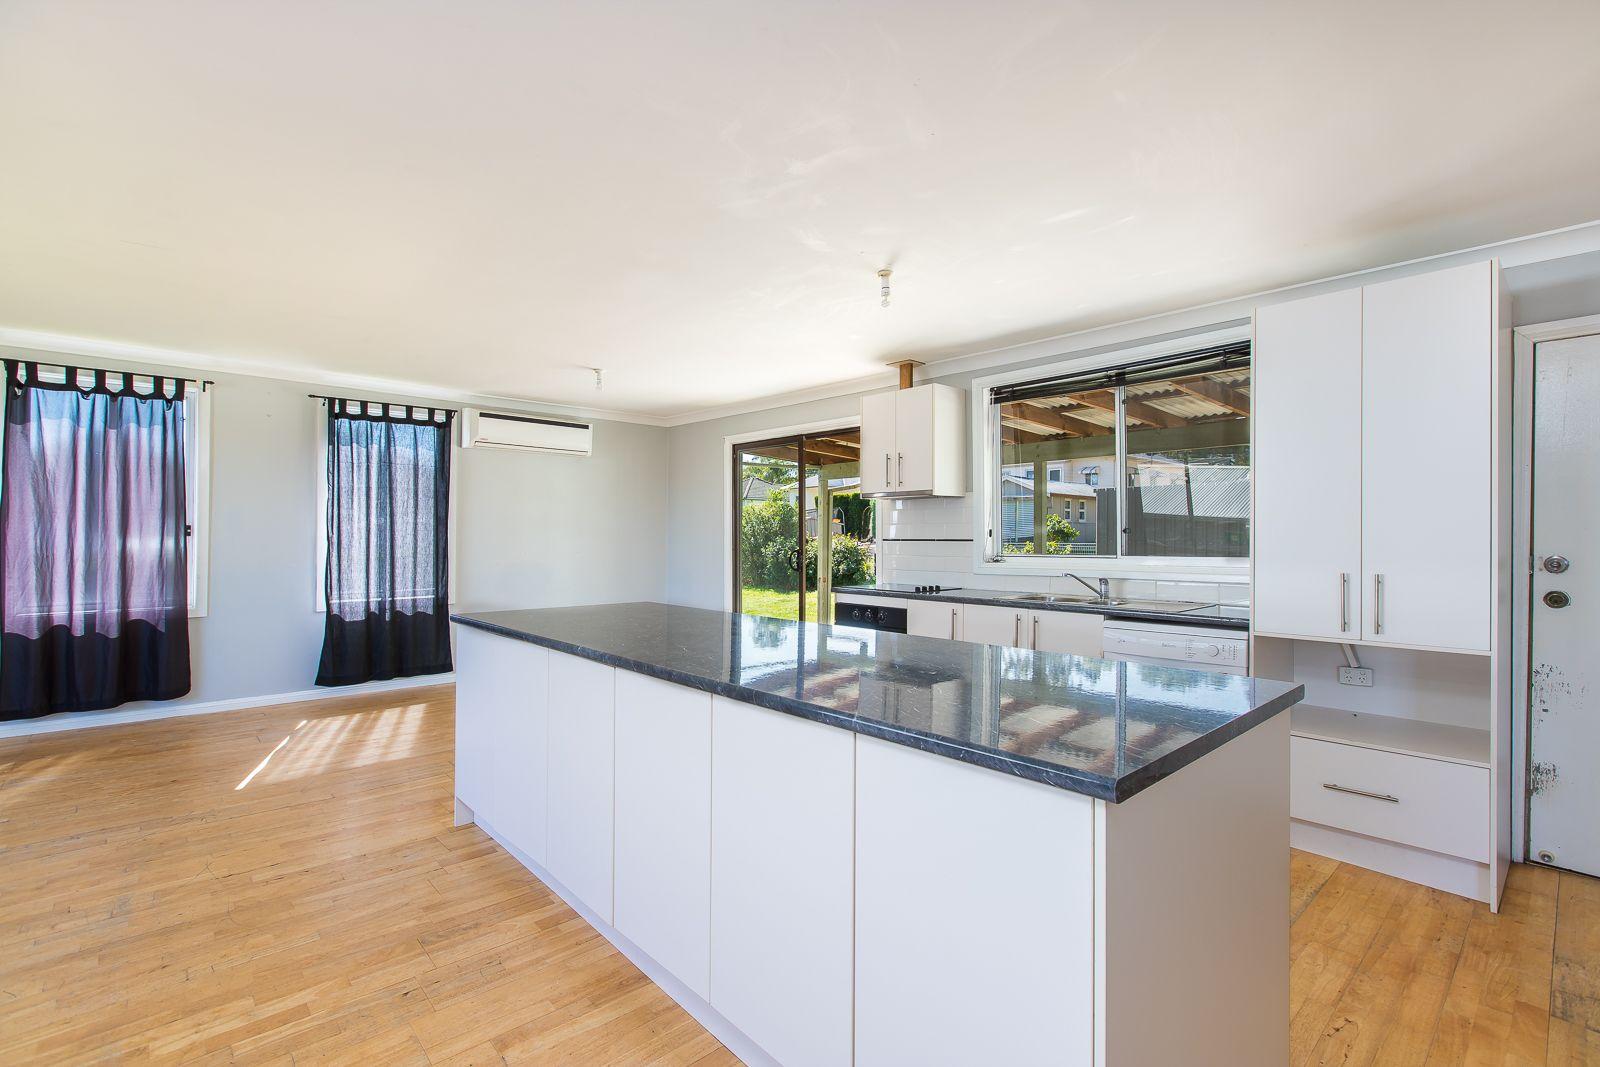 1 Farlow Street, Booragul NSW 2284, Image 1